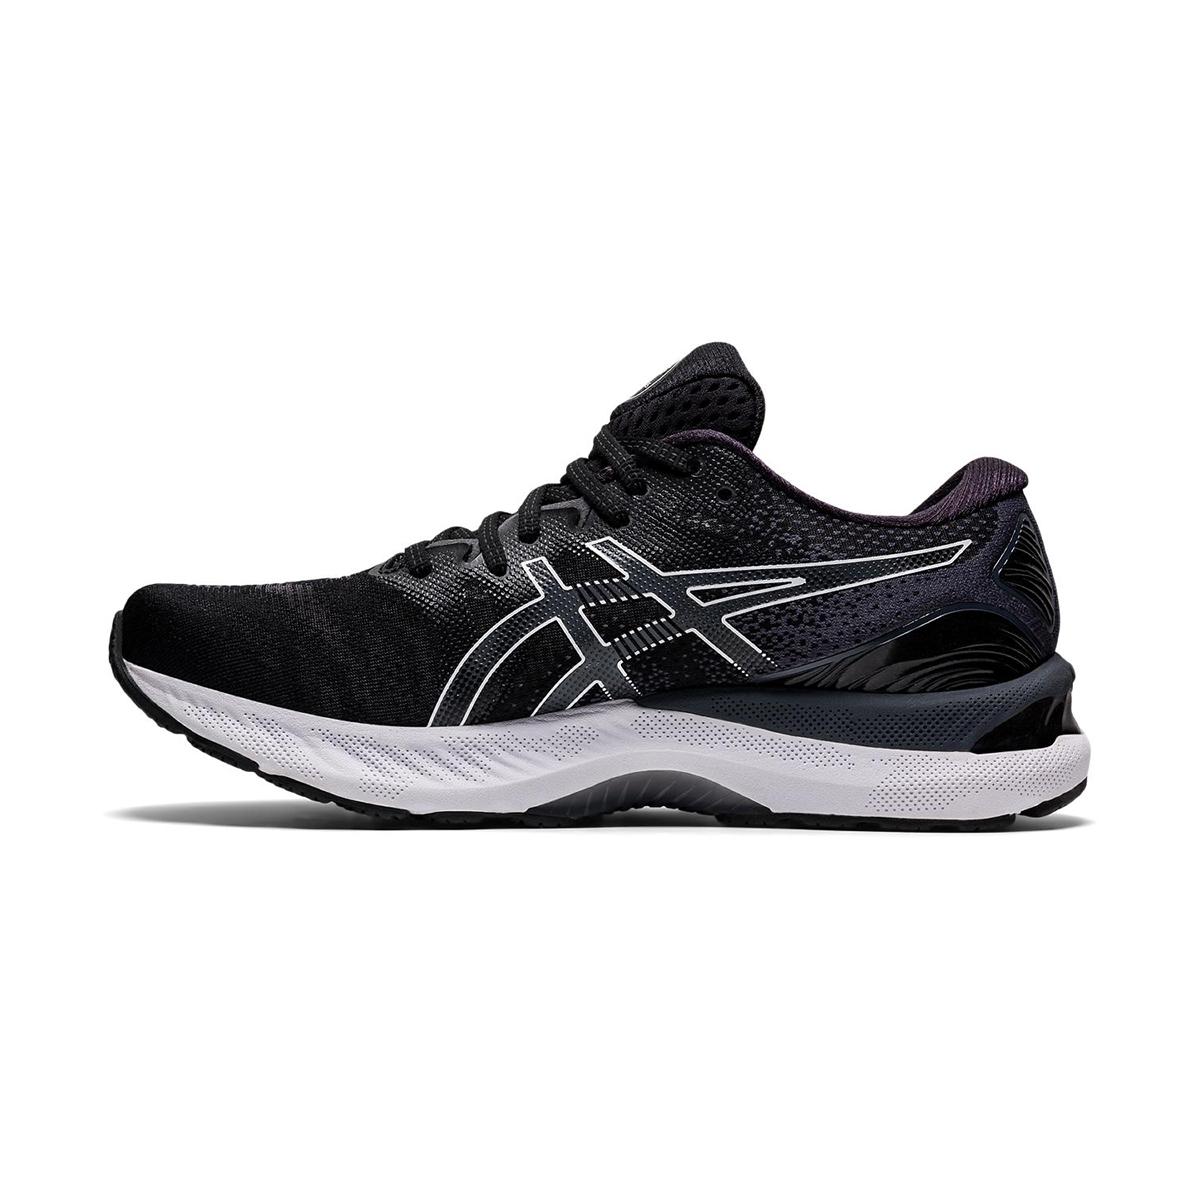 Men's Asics GEL-Nimbus 23 Running Shoe - Color: Black/White - Size: 7 - Width: Regular, Black/White, large, image 2